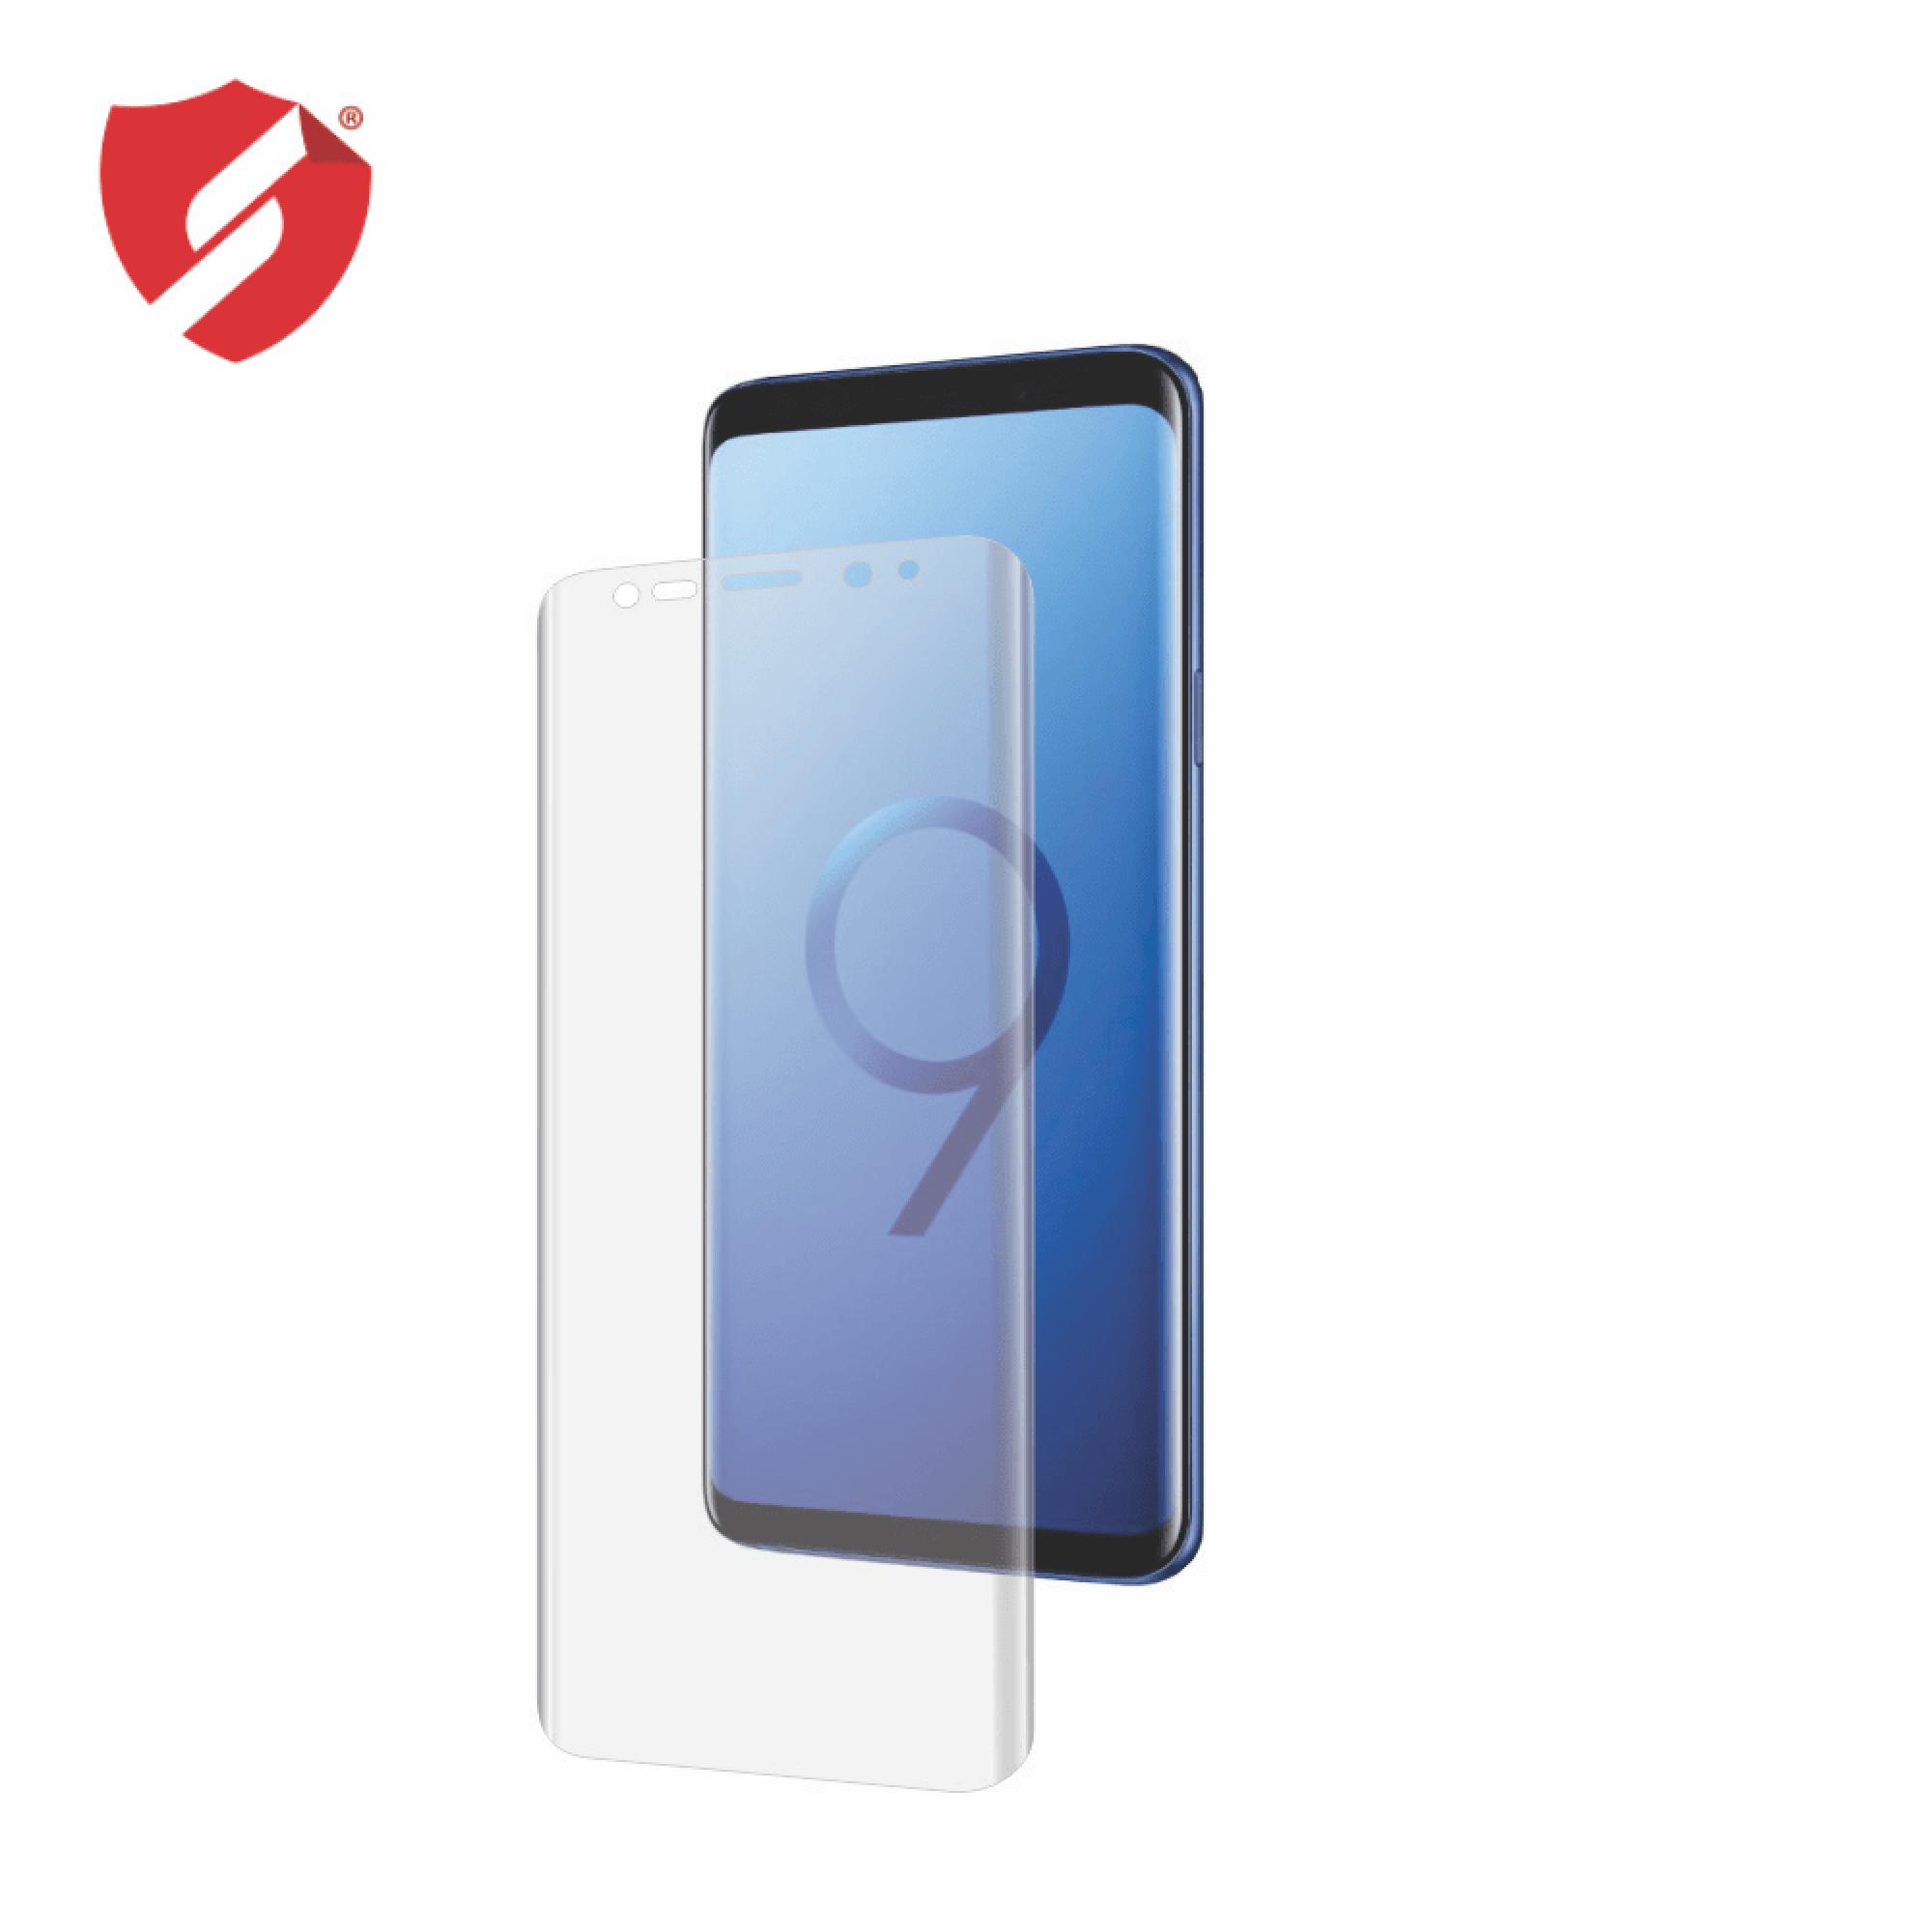 Folie de protectie Smart Protection Samsung Galaxy S9 compatibila cu carcasa Flip Cover - doar-display imagine